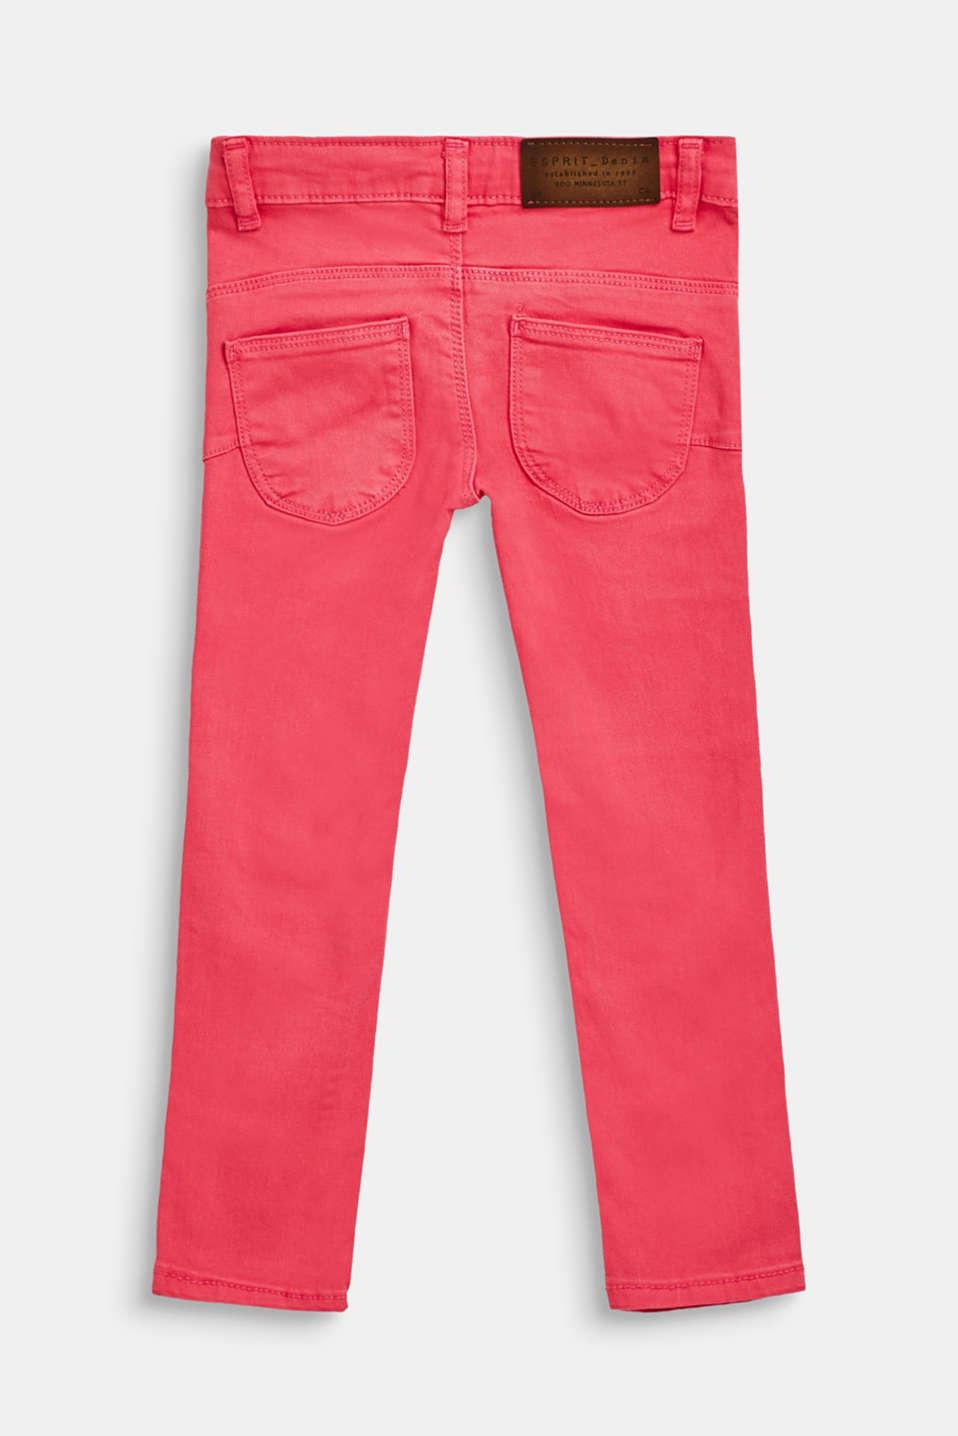 Pants denim, LCDARK PINK, detail image number 1